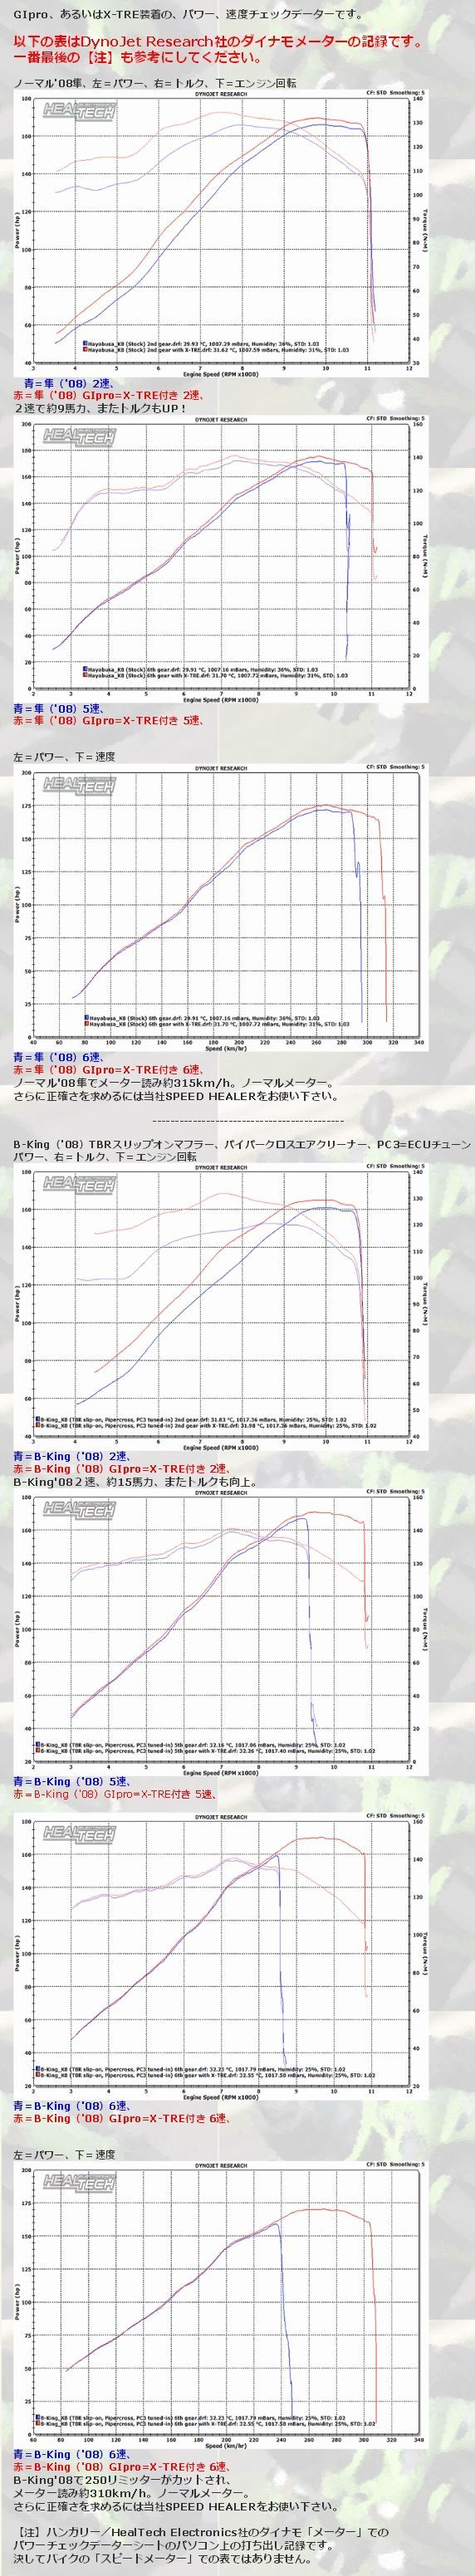 【HEALTECH ELECTRONICS】X-TREPower Box解限速 - 「Webike-摩托百貨」